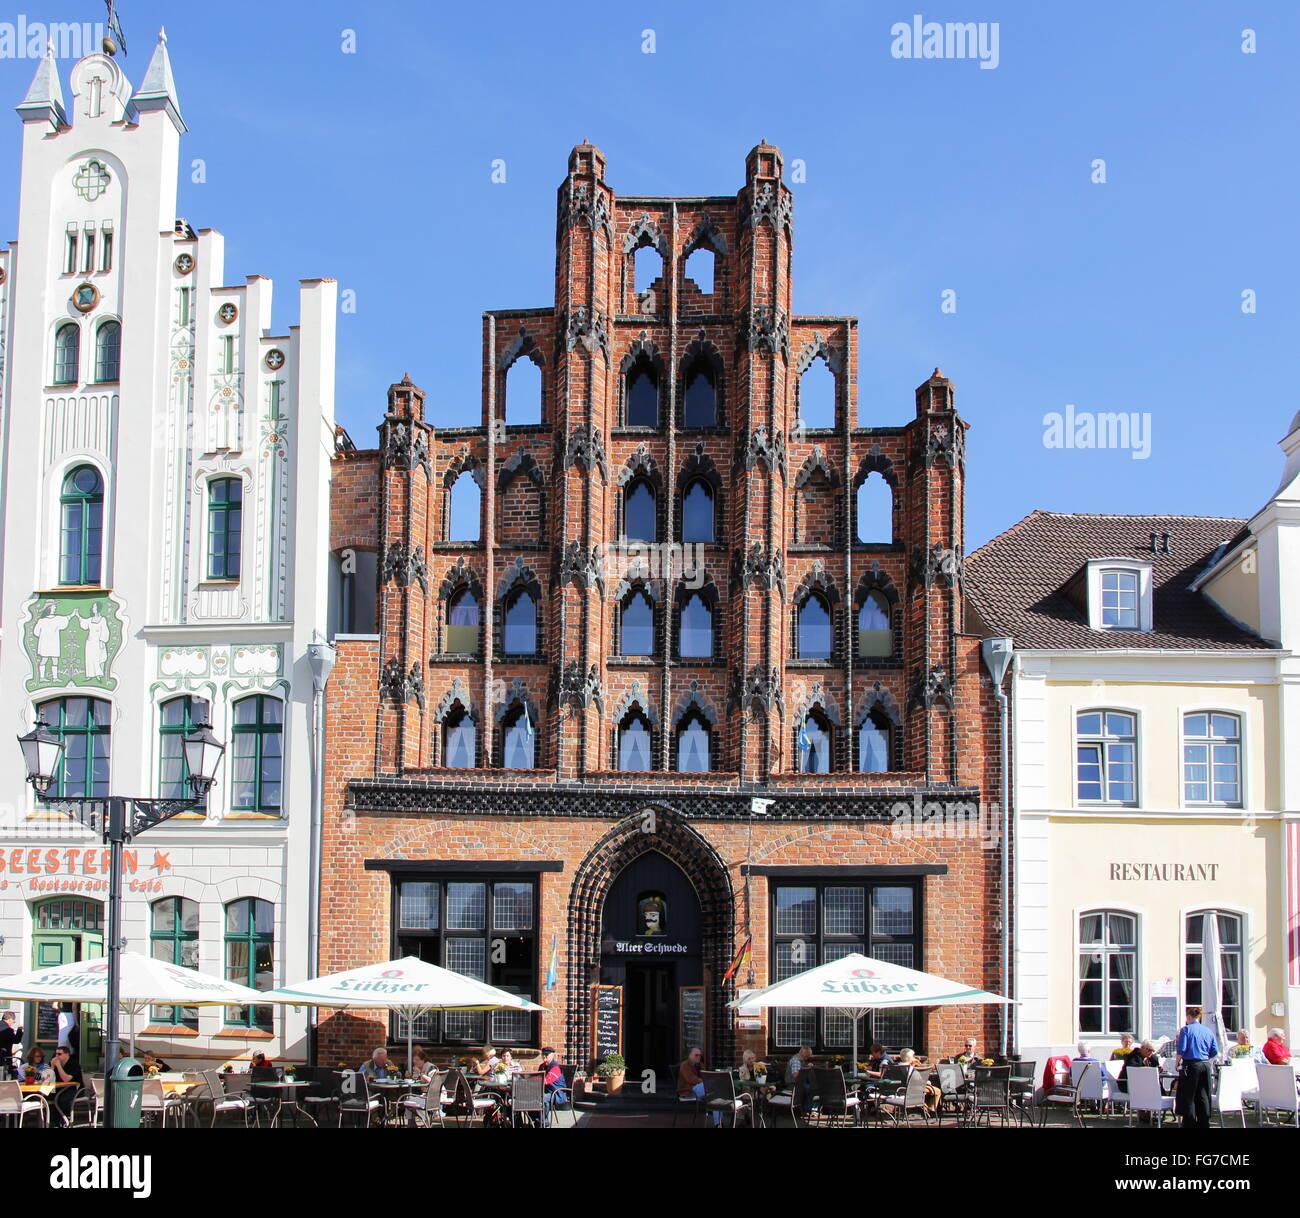 geography / travel, Germany, Mecklenburg-West Pomerania, Wismar, buildings, Am Markt, 'Alter Schwede' (building), - Stock Image